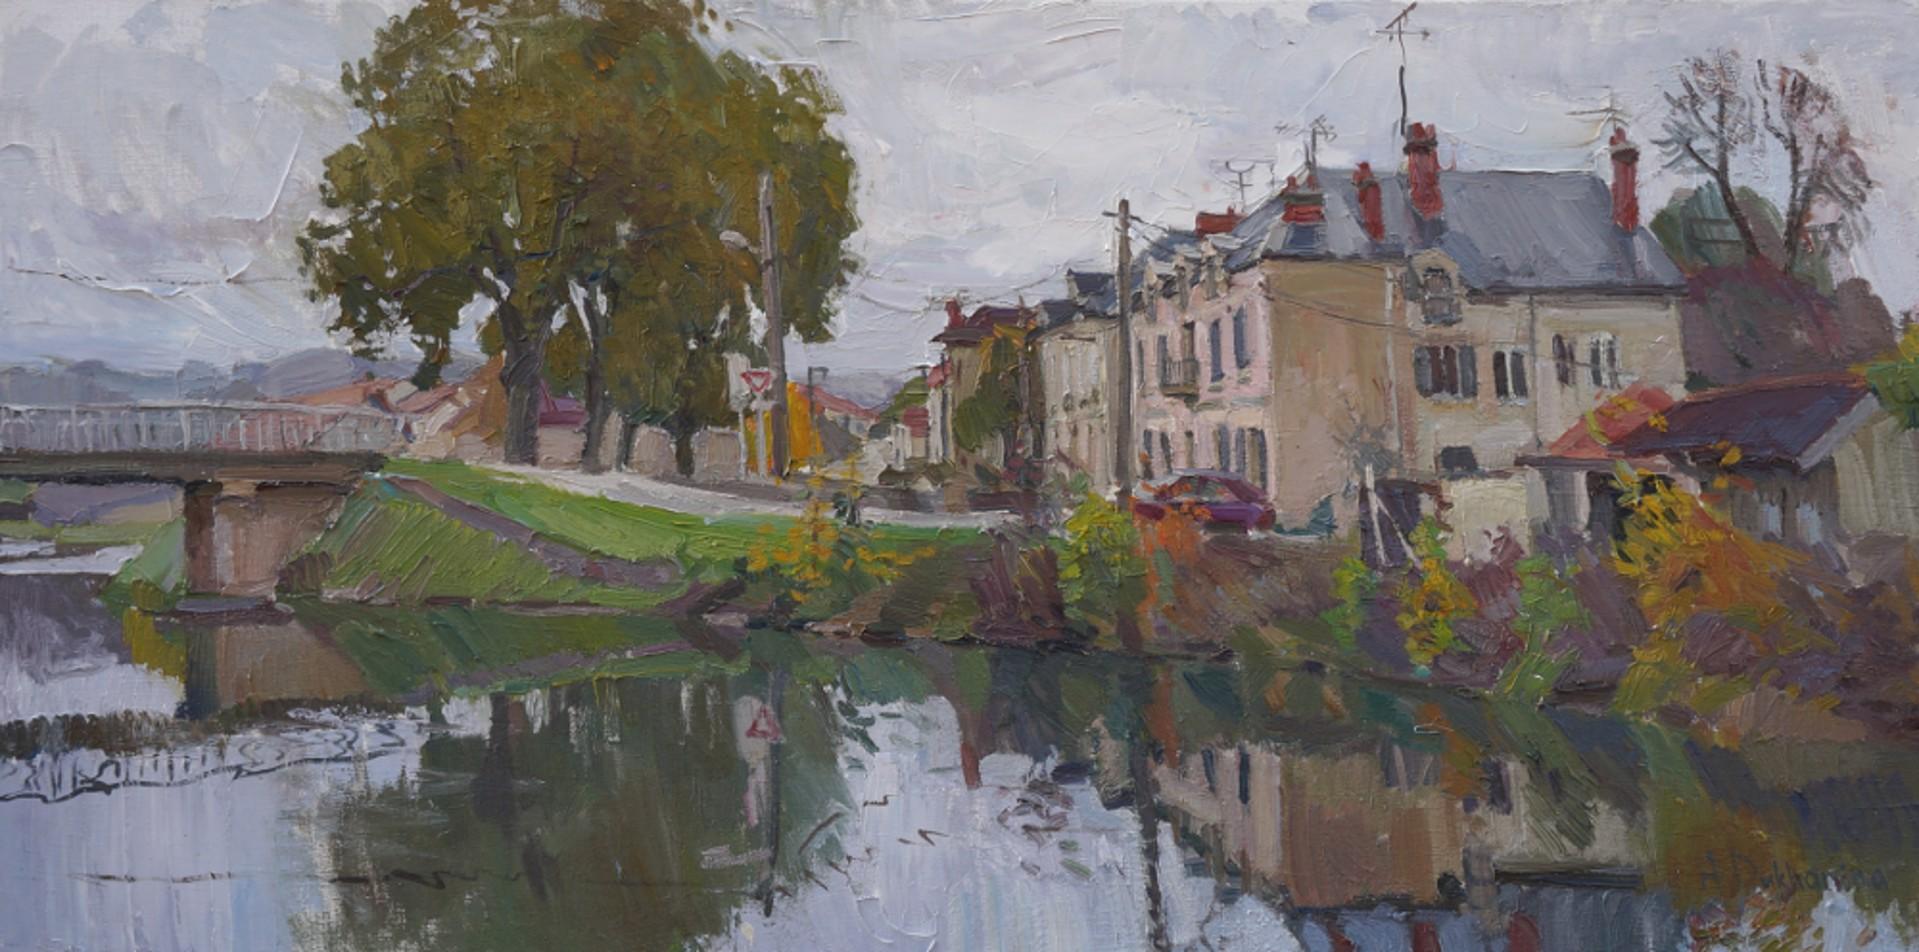 Ravieres in November by Anastasia Dukhanina